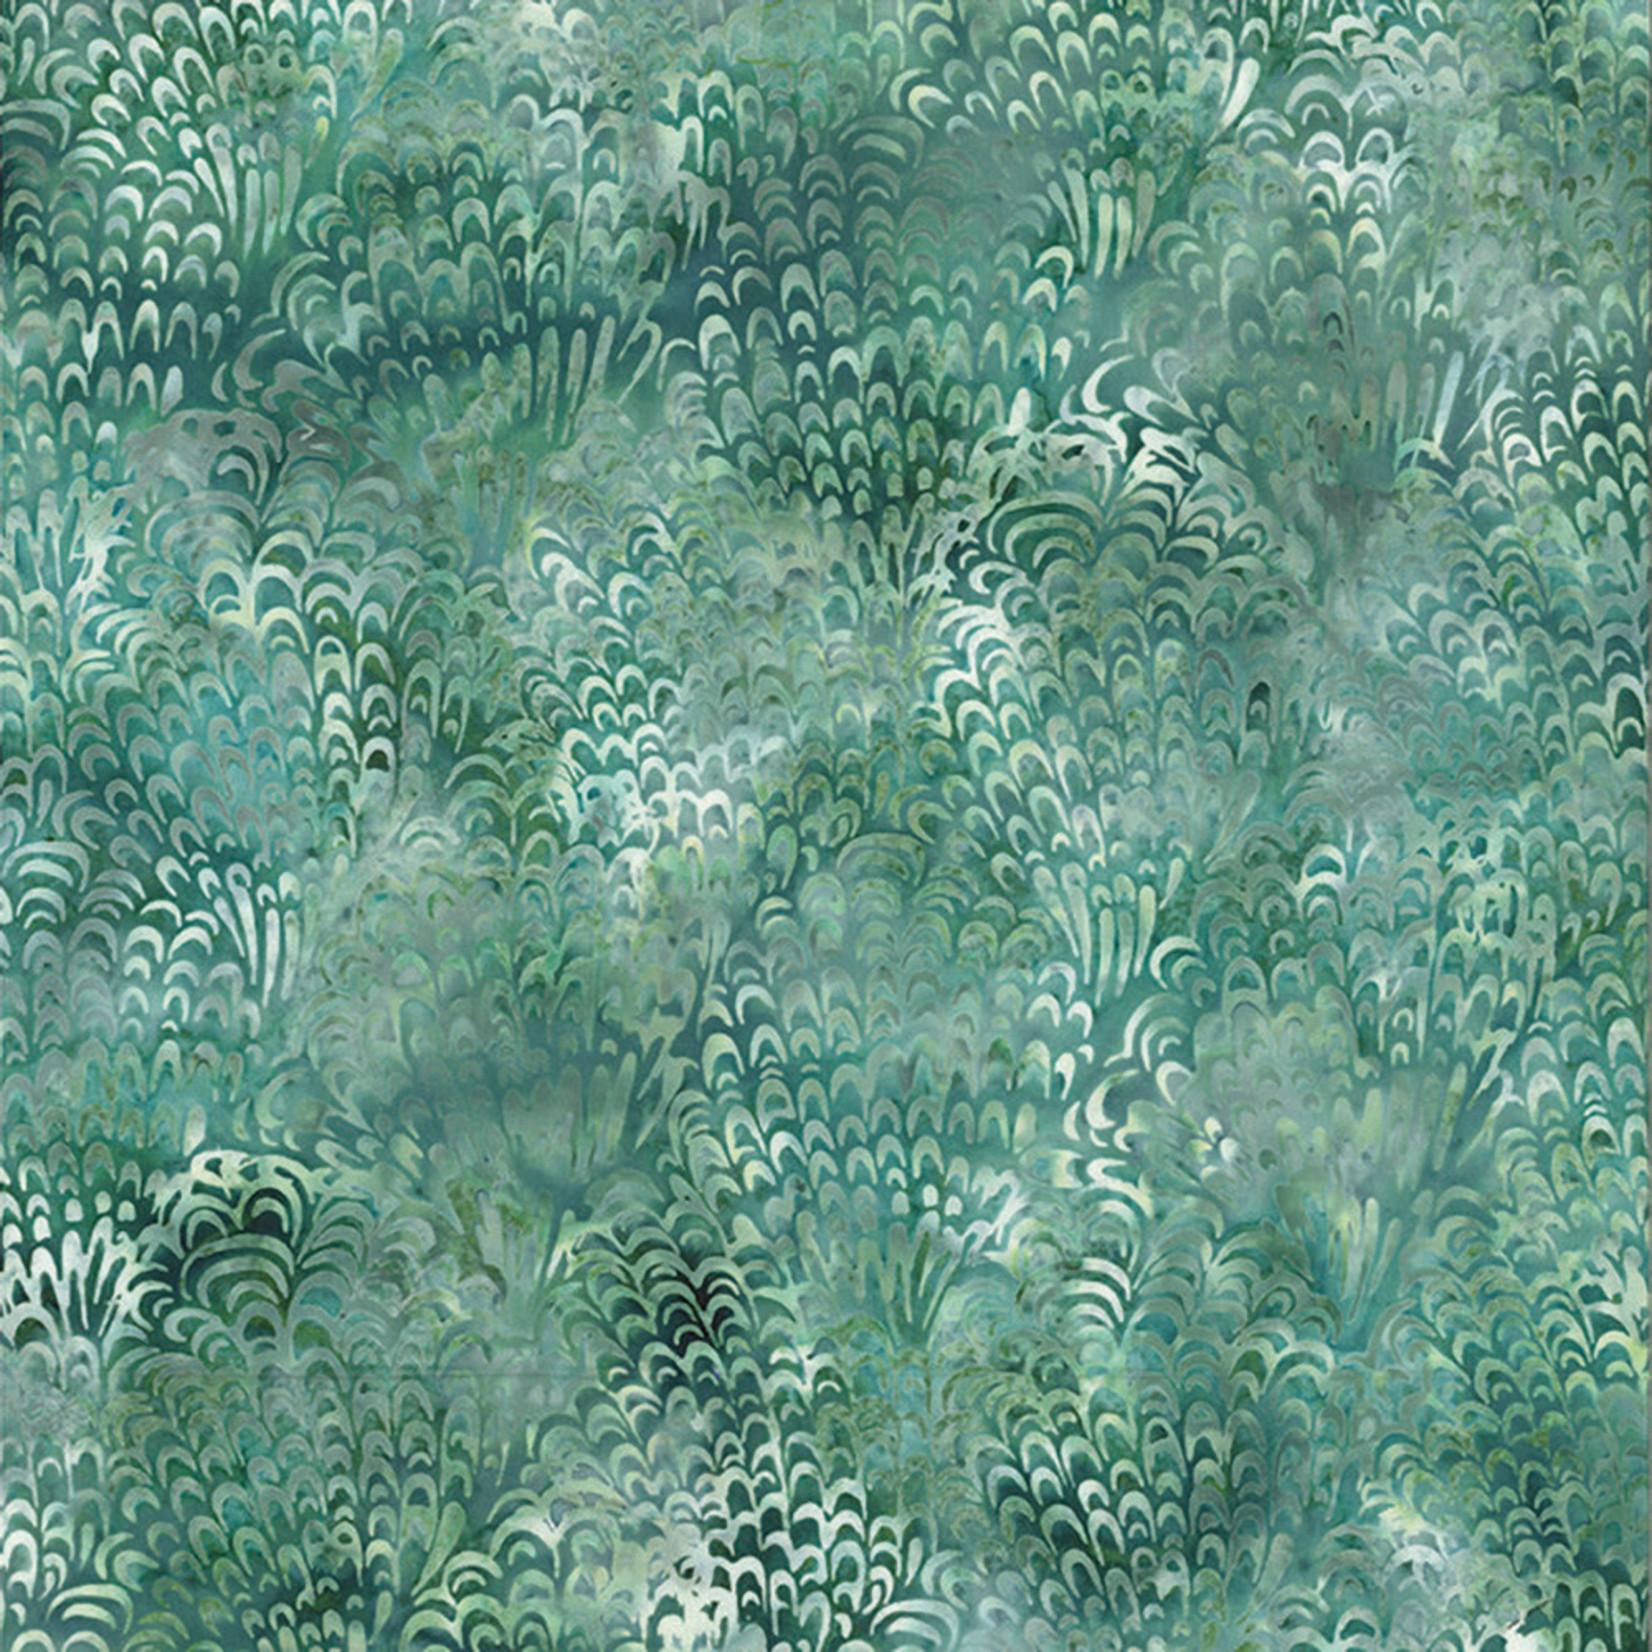 Hoffman Fabrics Bali Batik Peacock - Seagrass